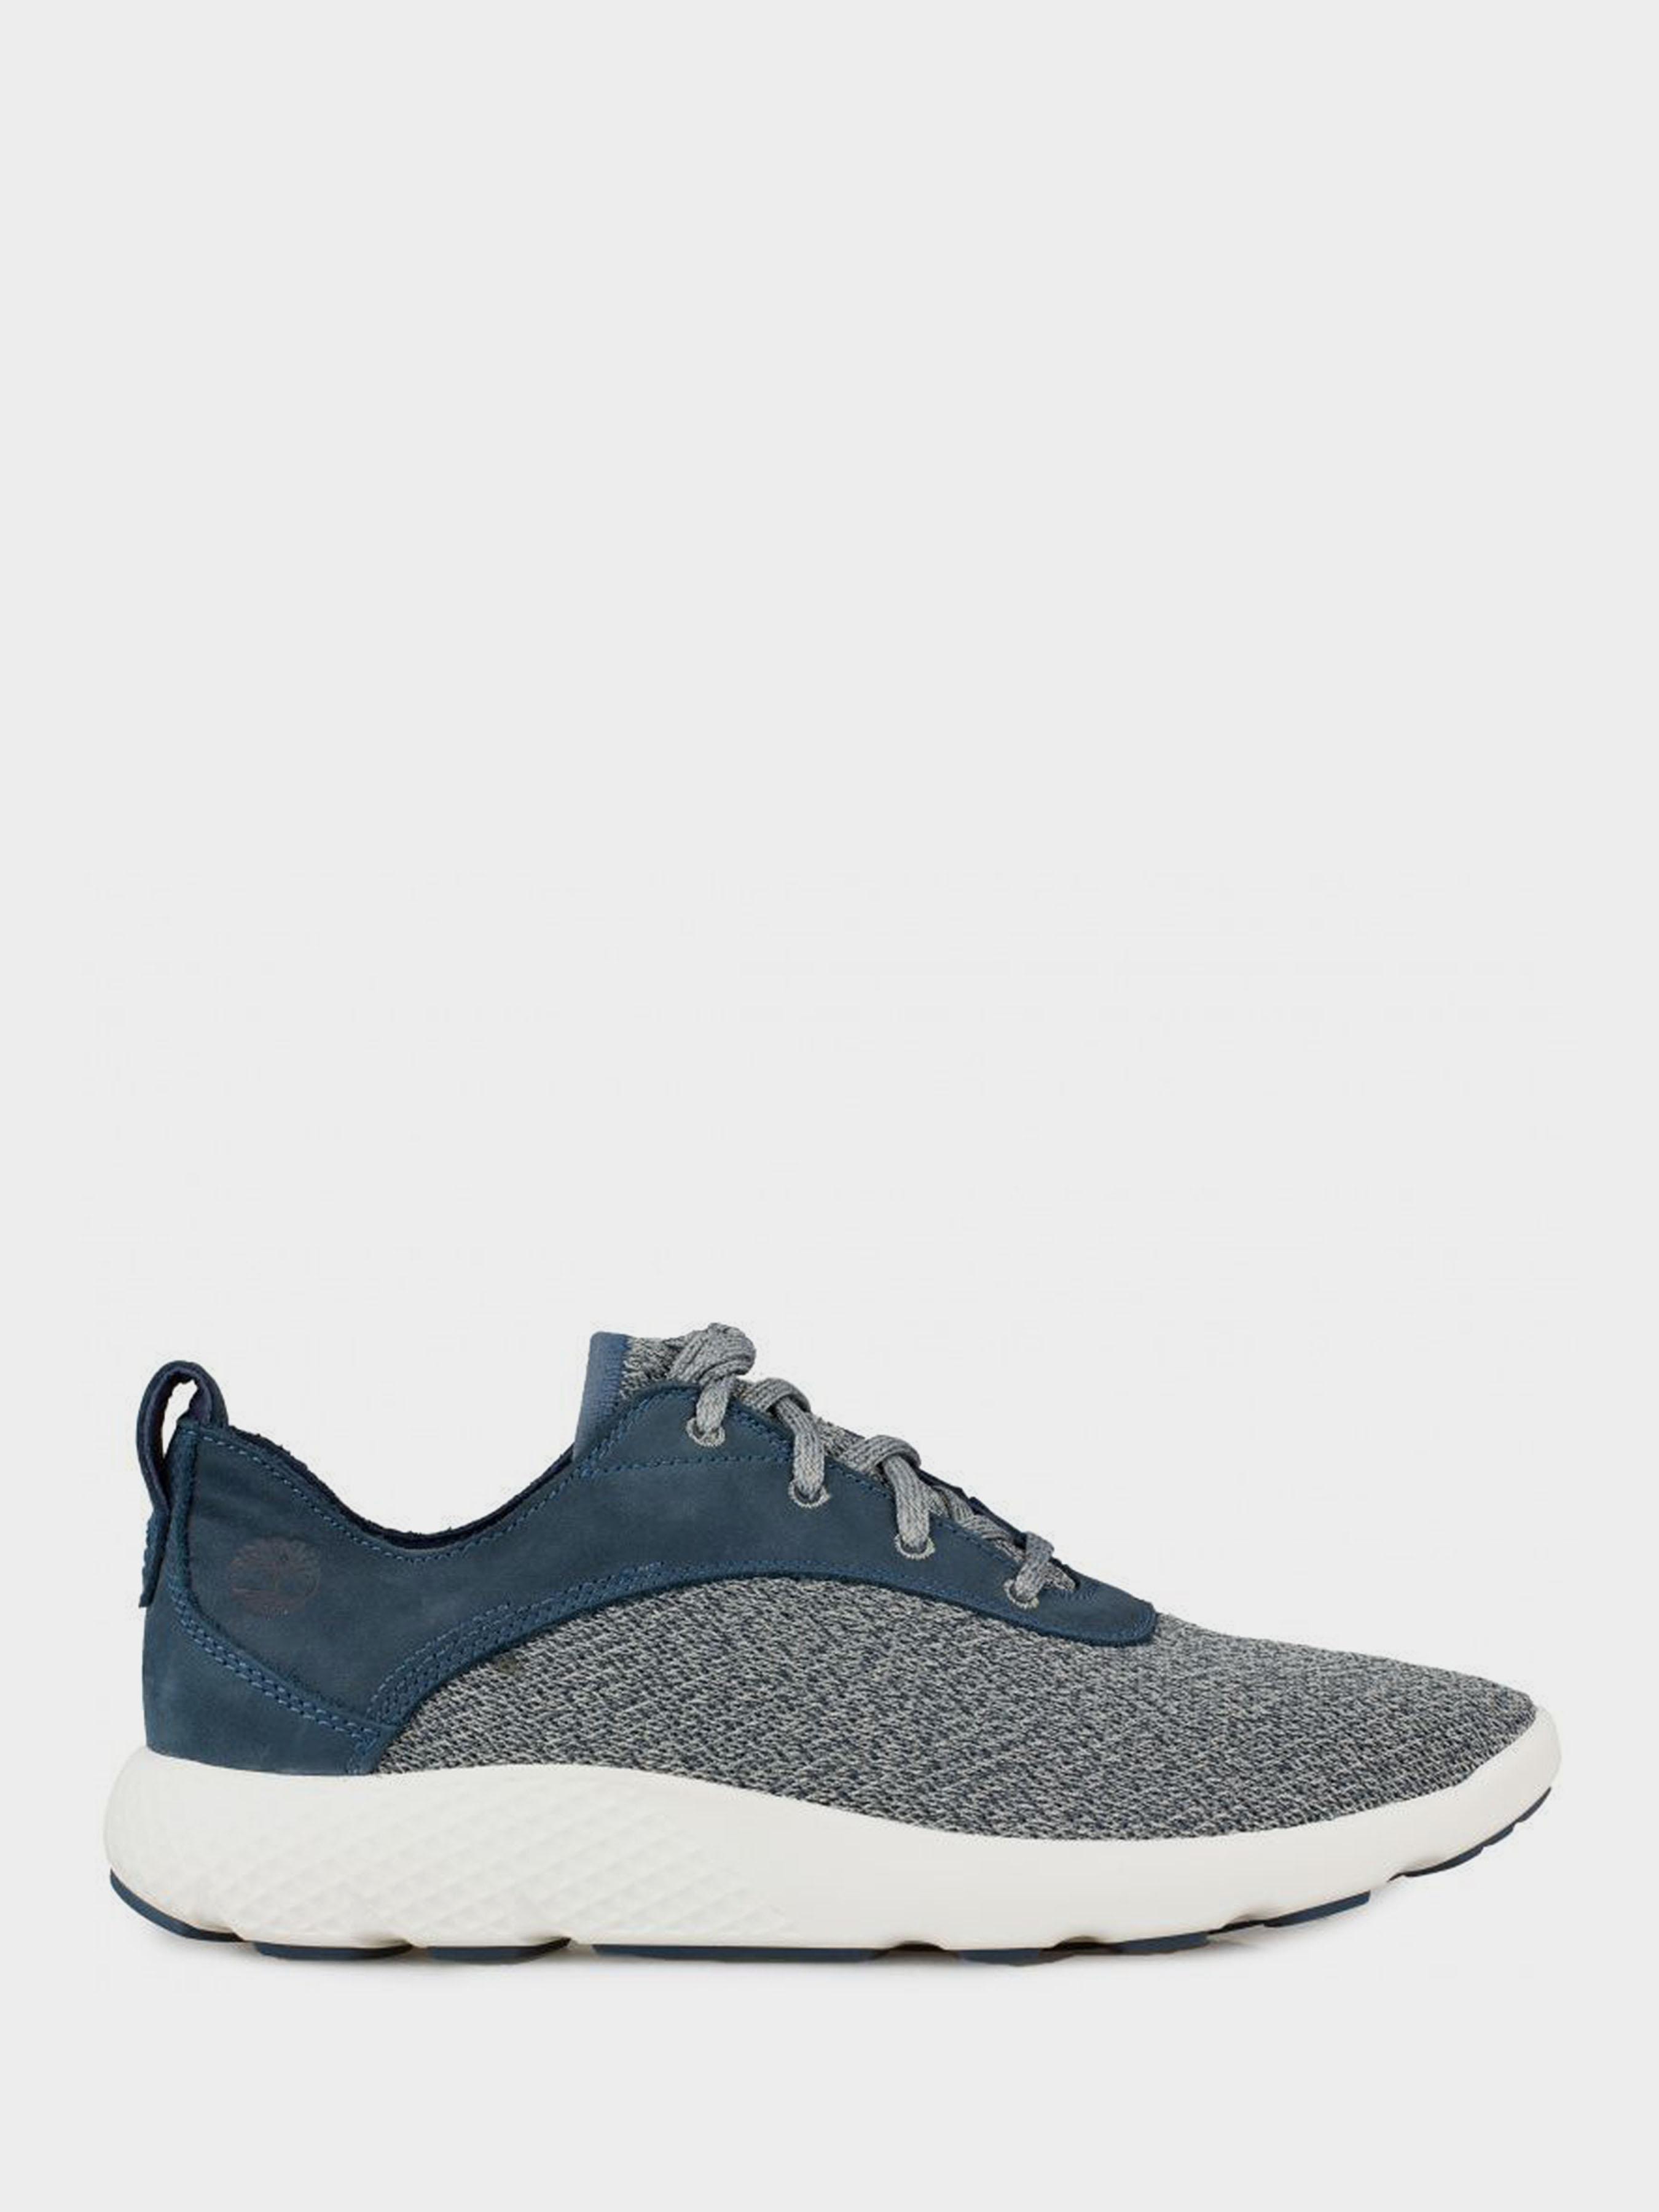 Обувь Timberland (Тимберленд) - купить обувь Timberland в Киеве ... fc1ff75208c